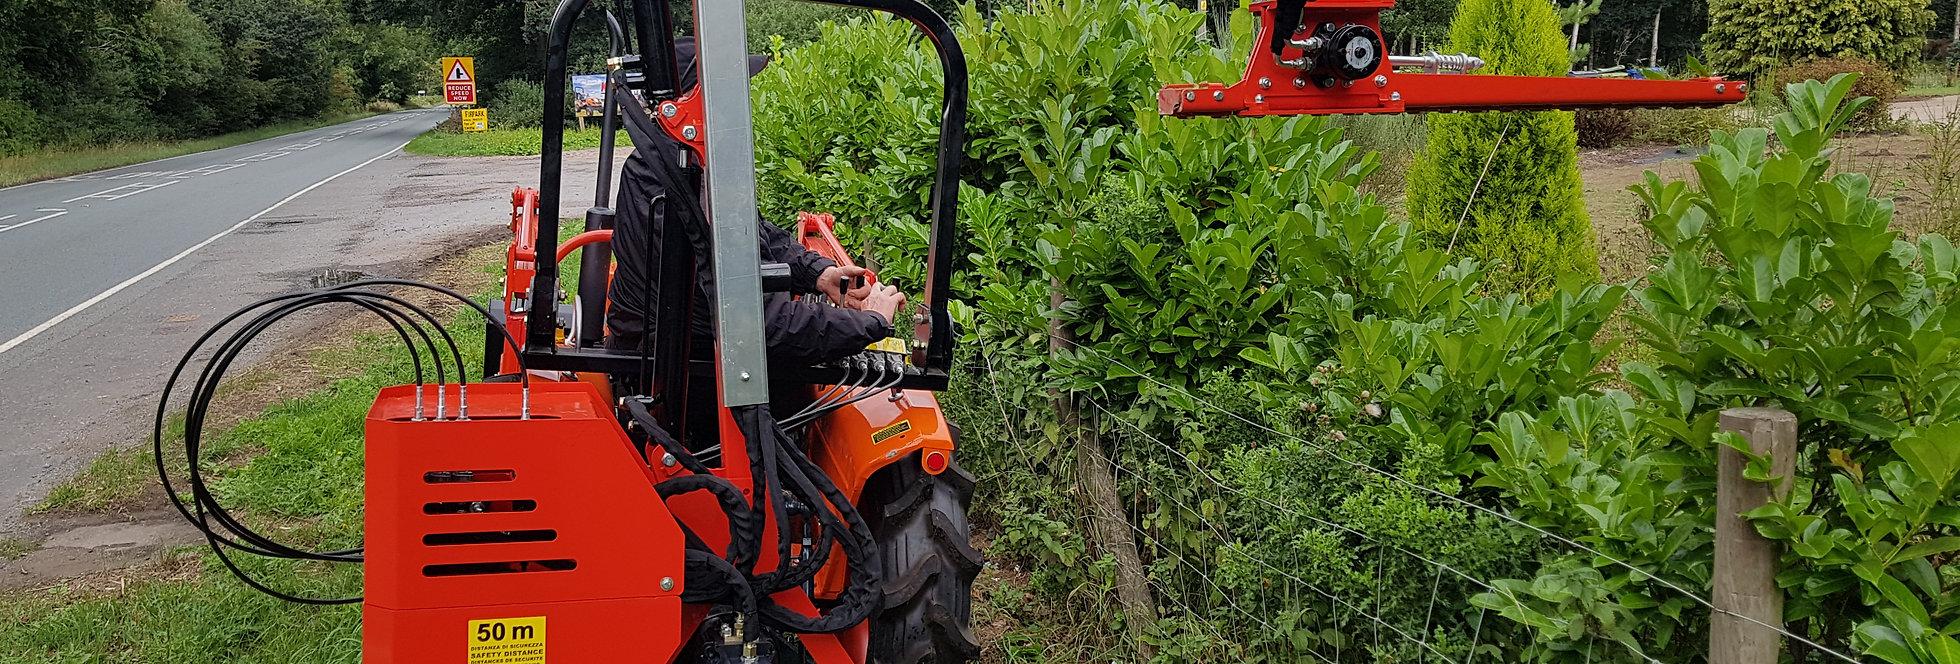 Tree Trimming Tractor Attachment